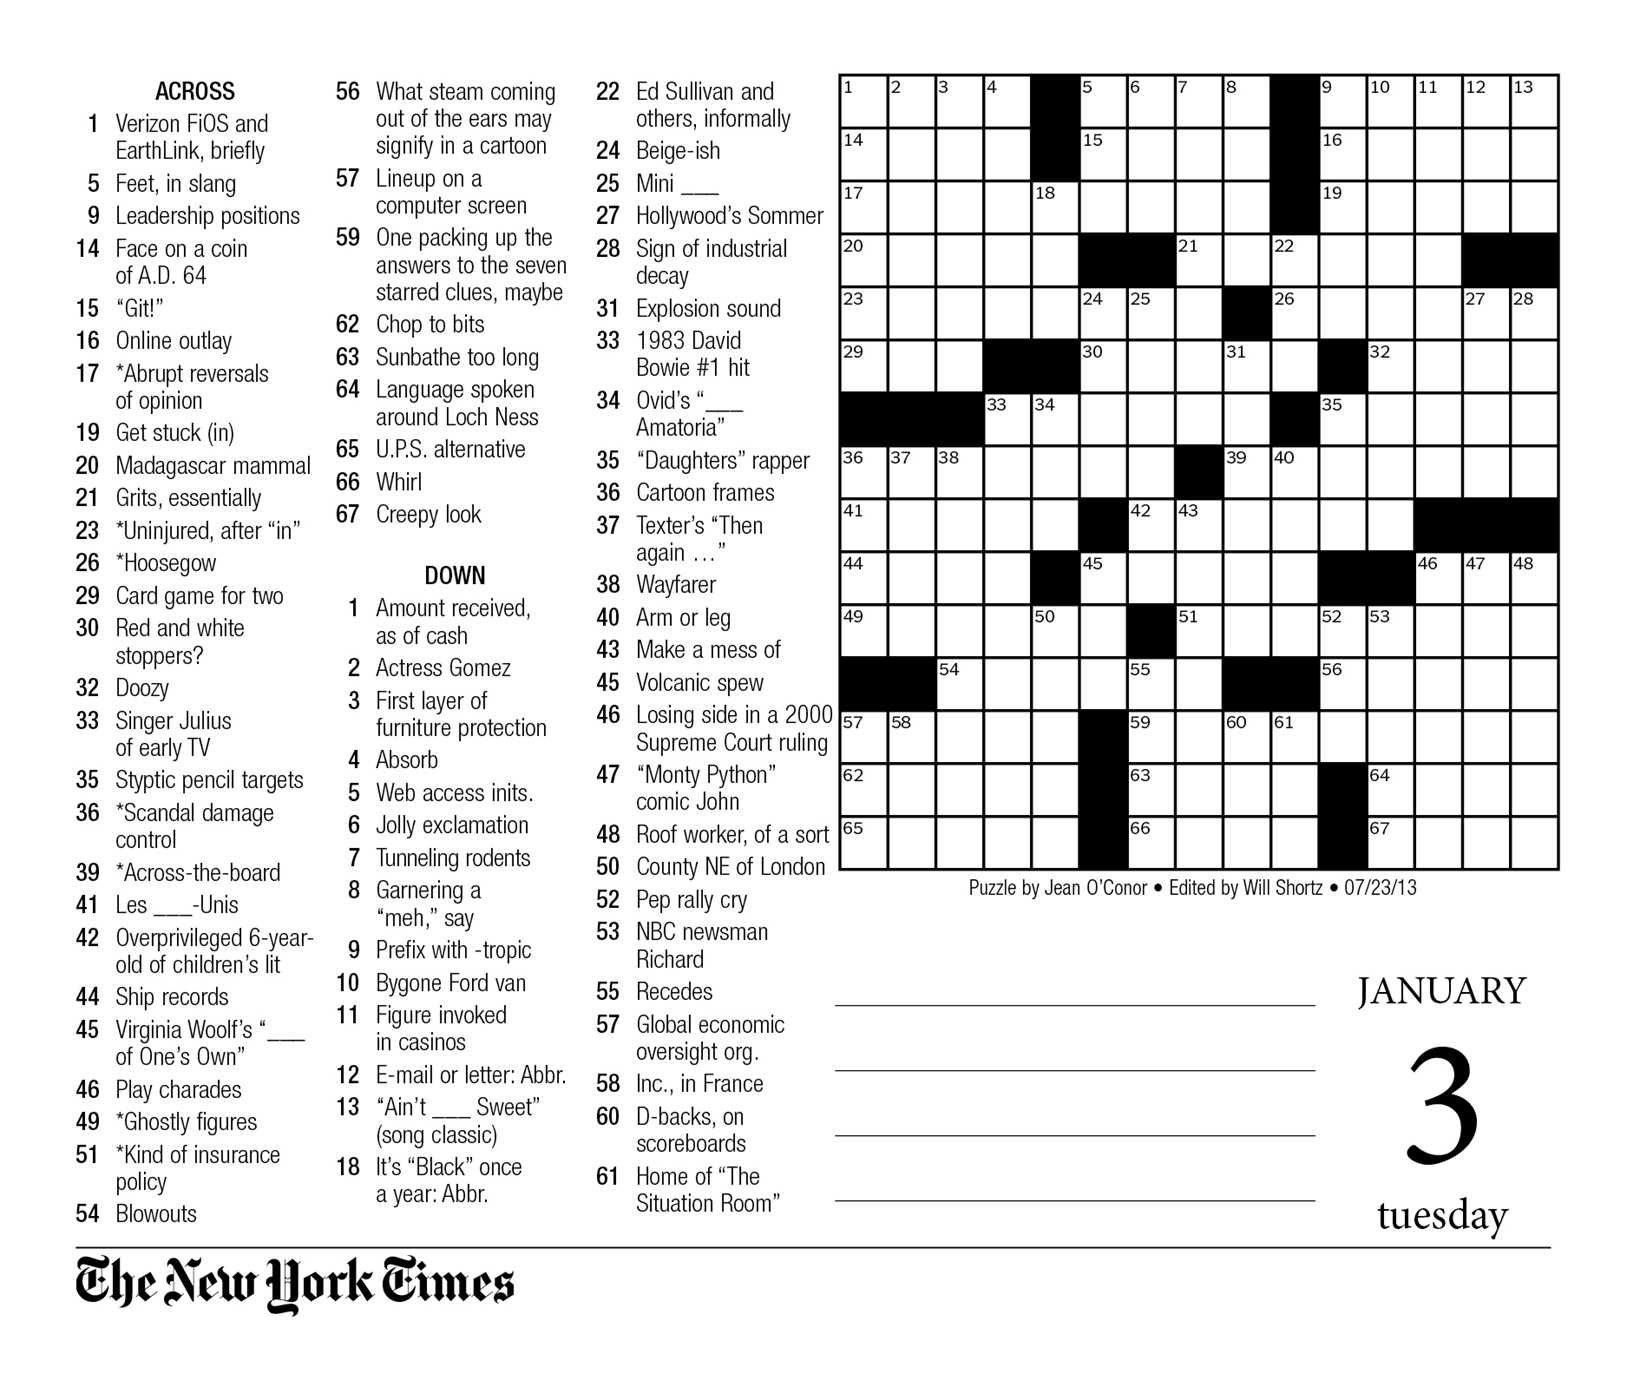 Crosswords Sunday Crossword Puzzle Printable ~ Themarketonholly - Printable Sunday Crossword Puzzles New York Times